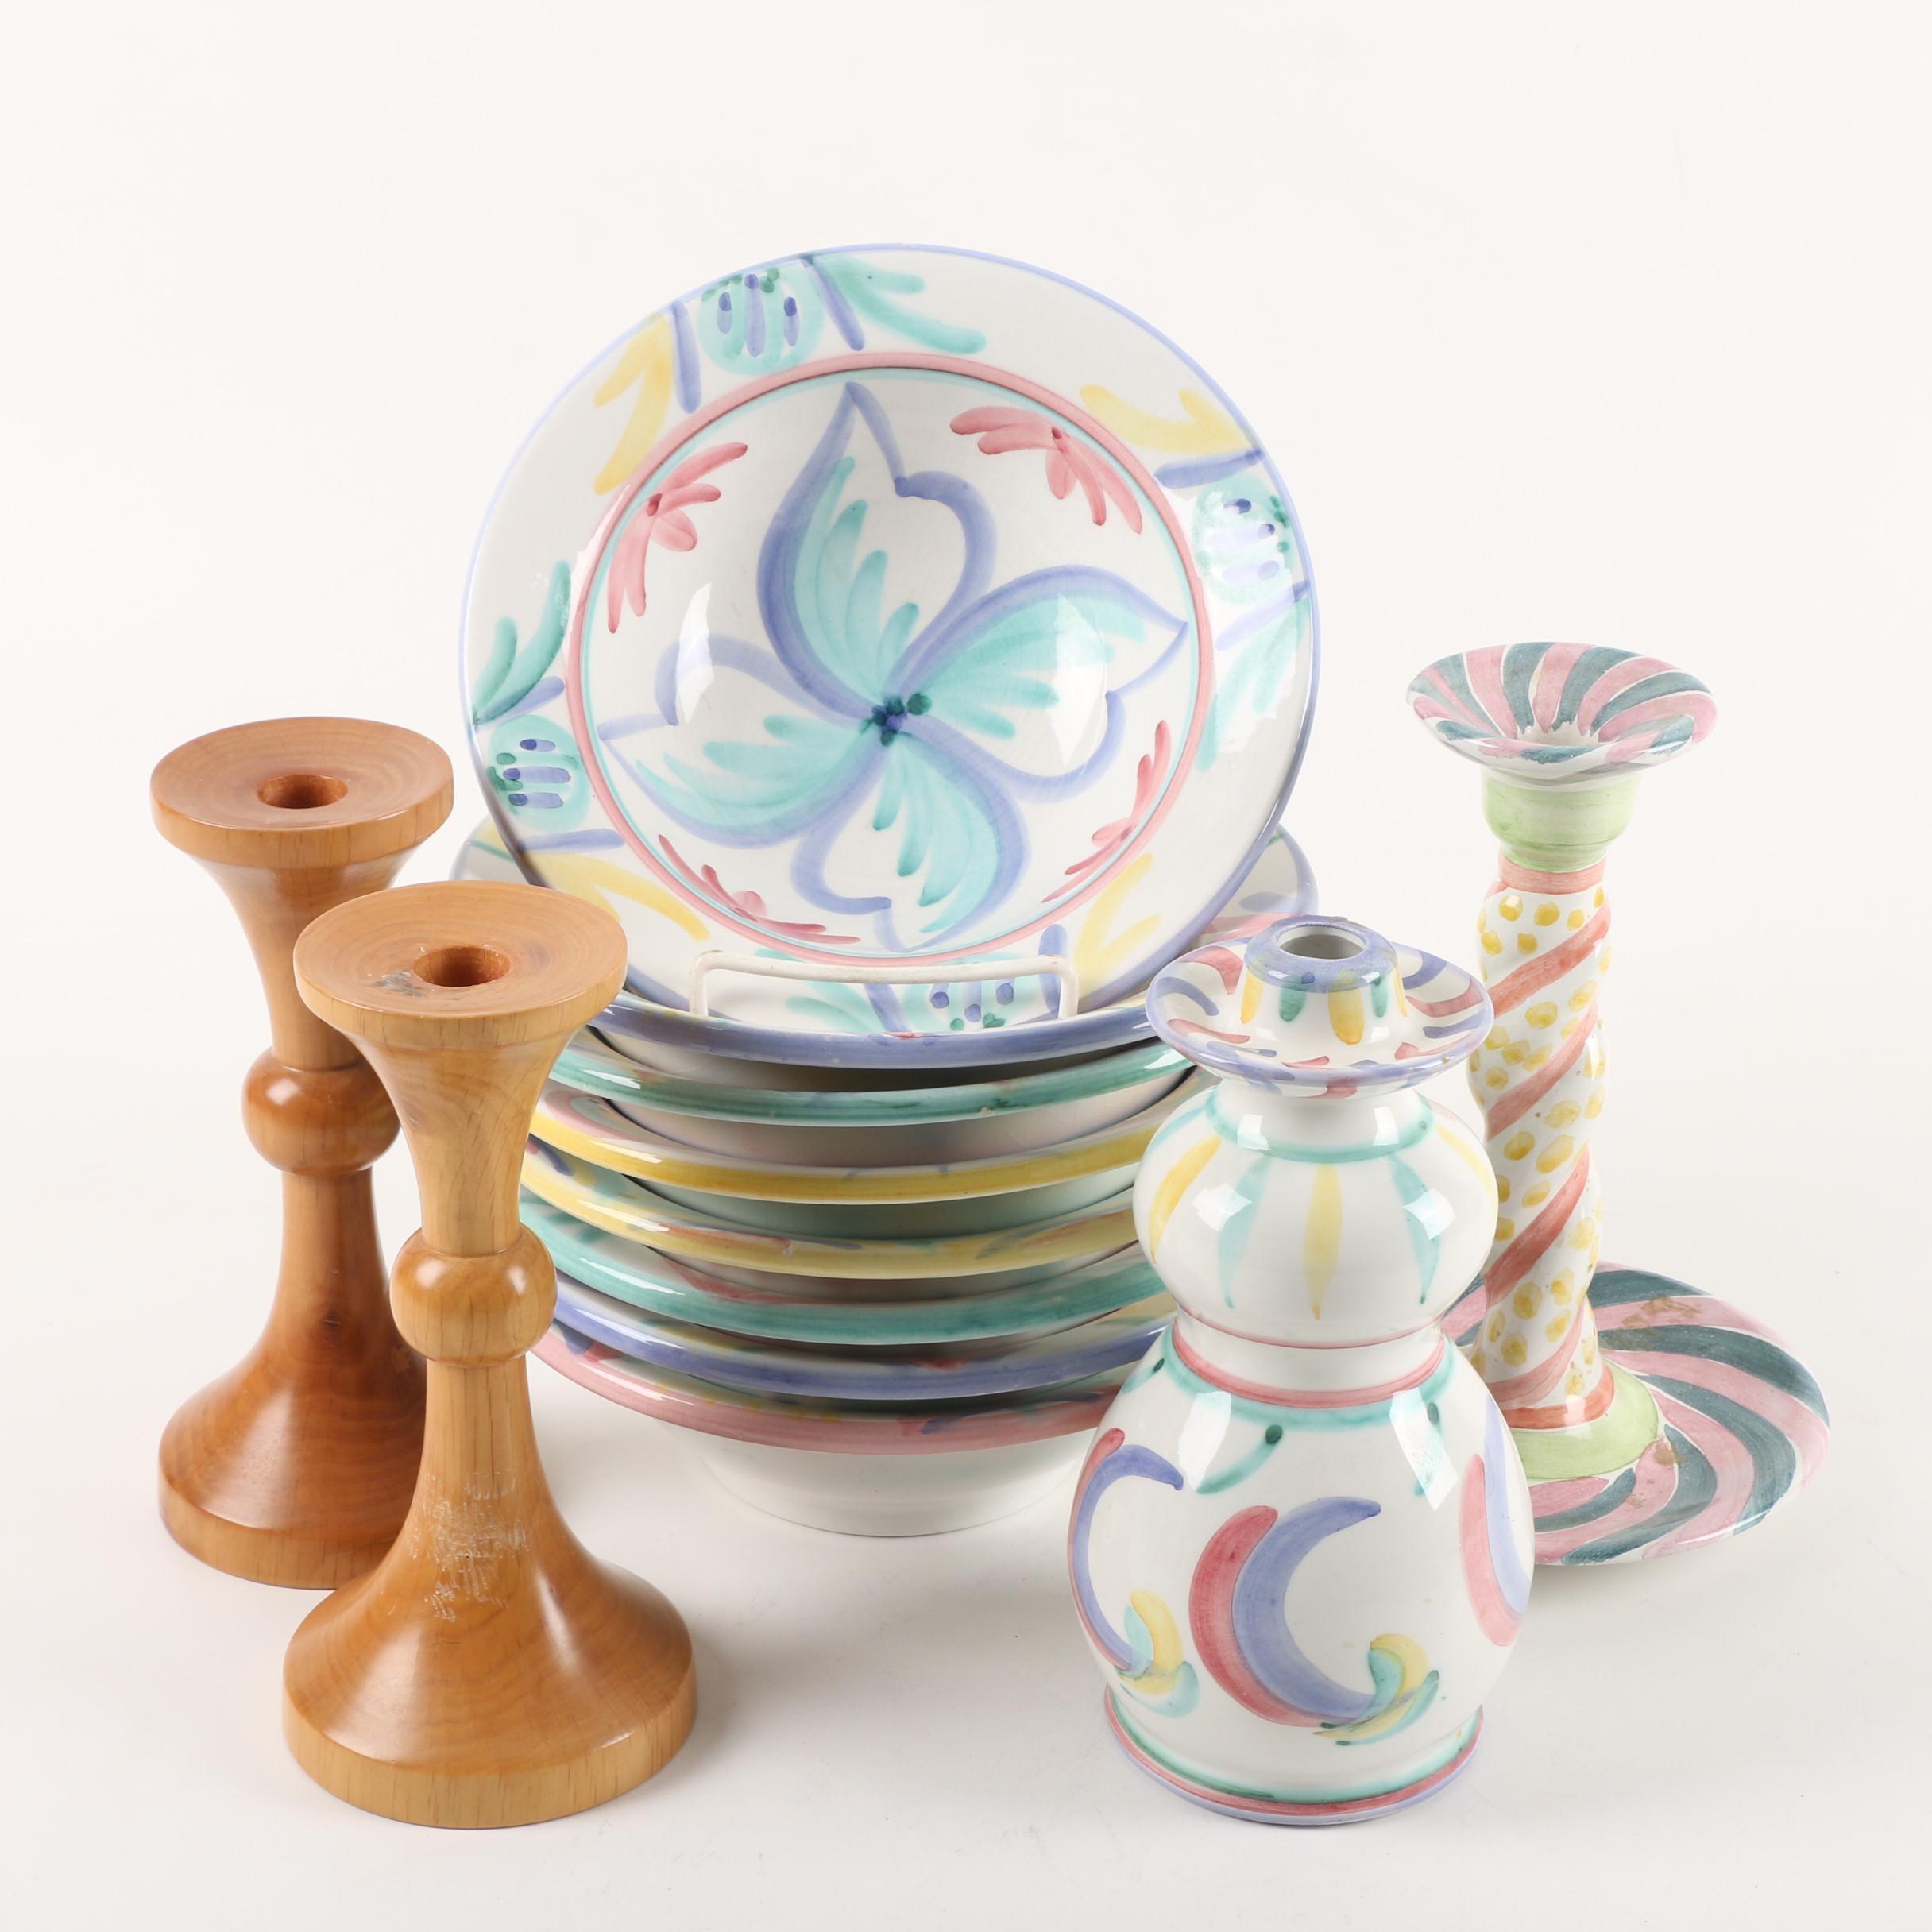 MacKenzie-Childs Candlestick with Vietri Italian Maiolica Style Tableware